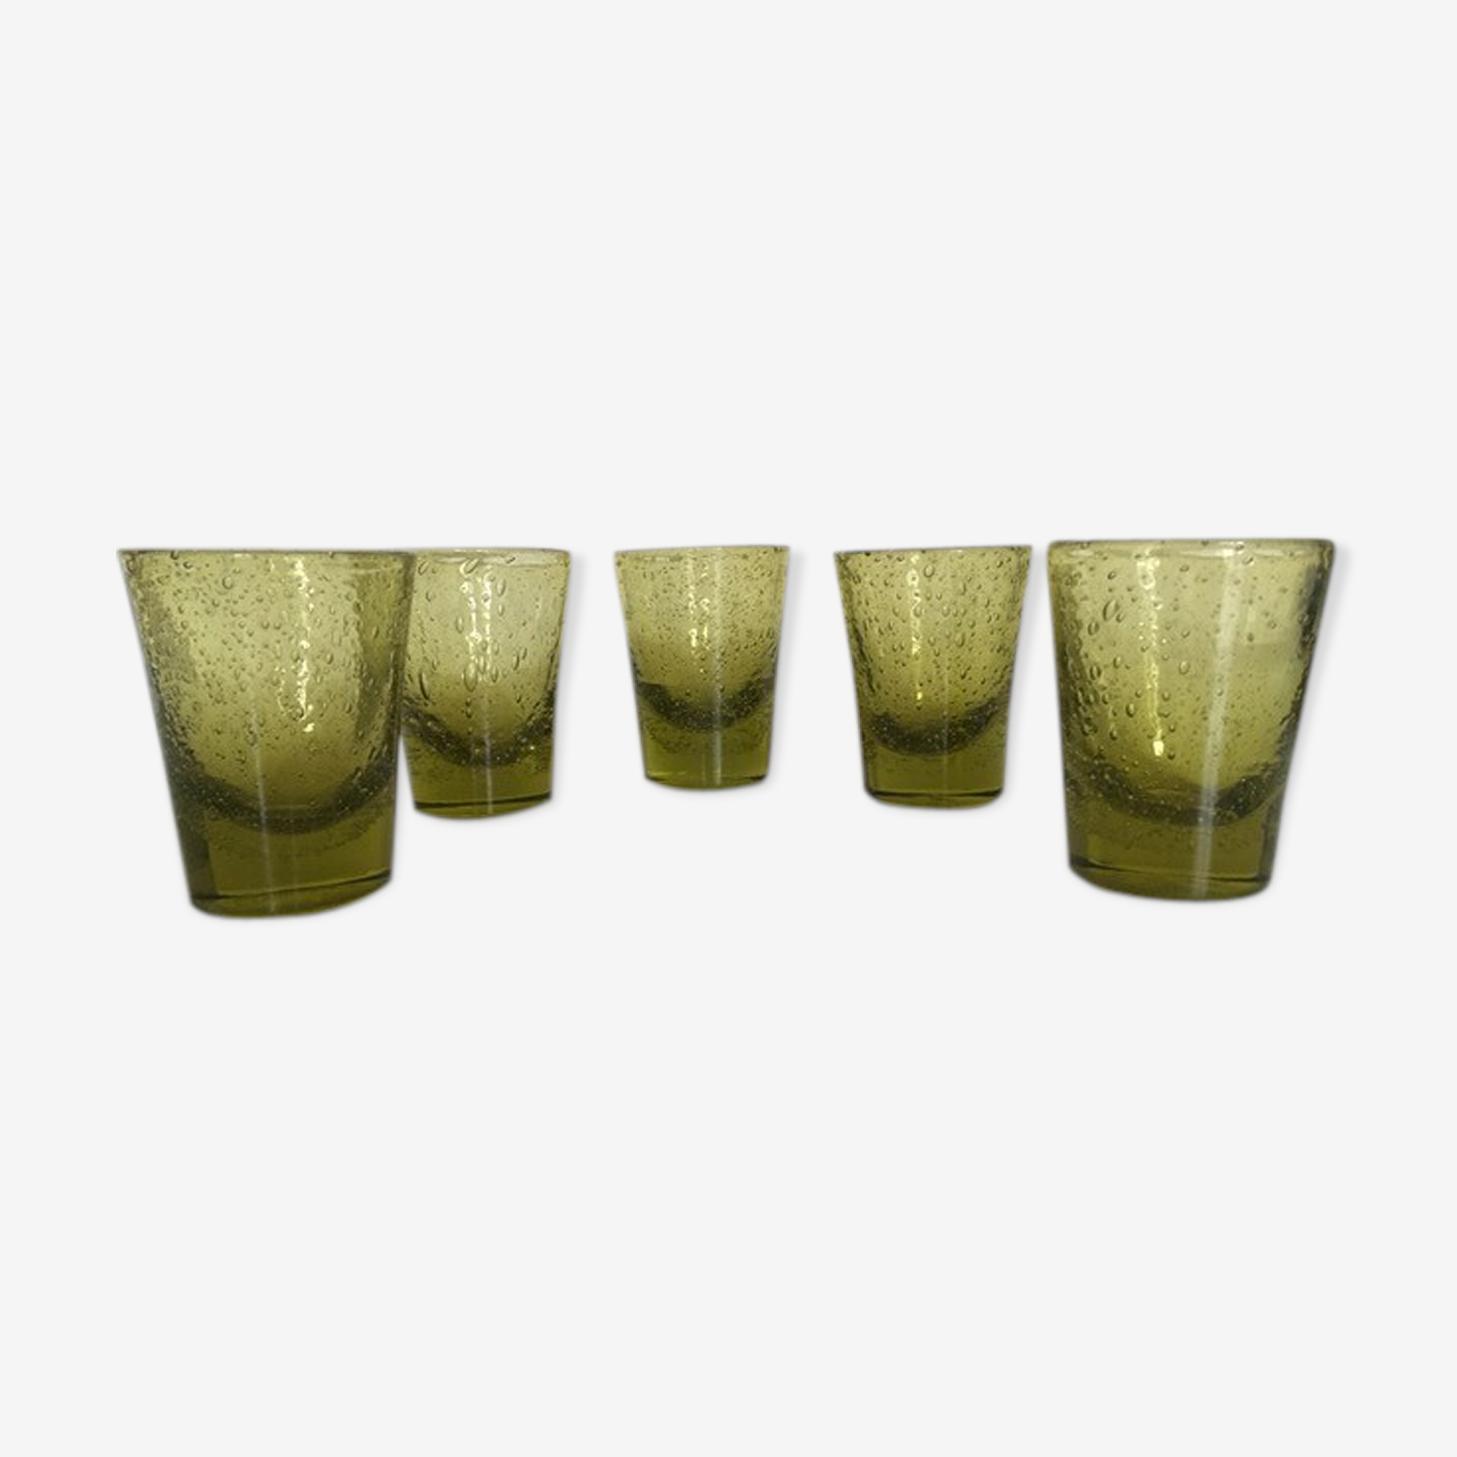 Set of 5 Biot glass cups green khaki 60